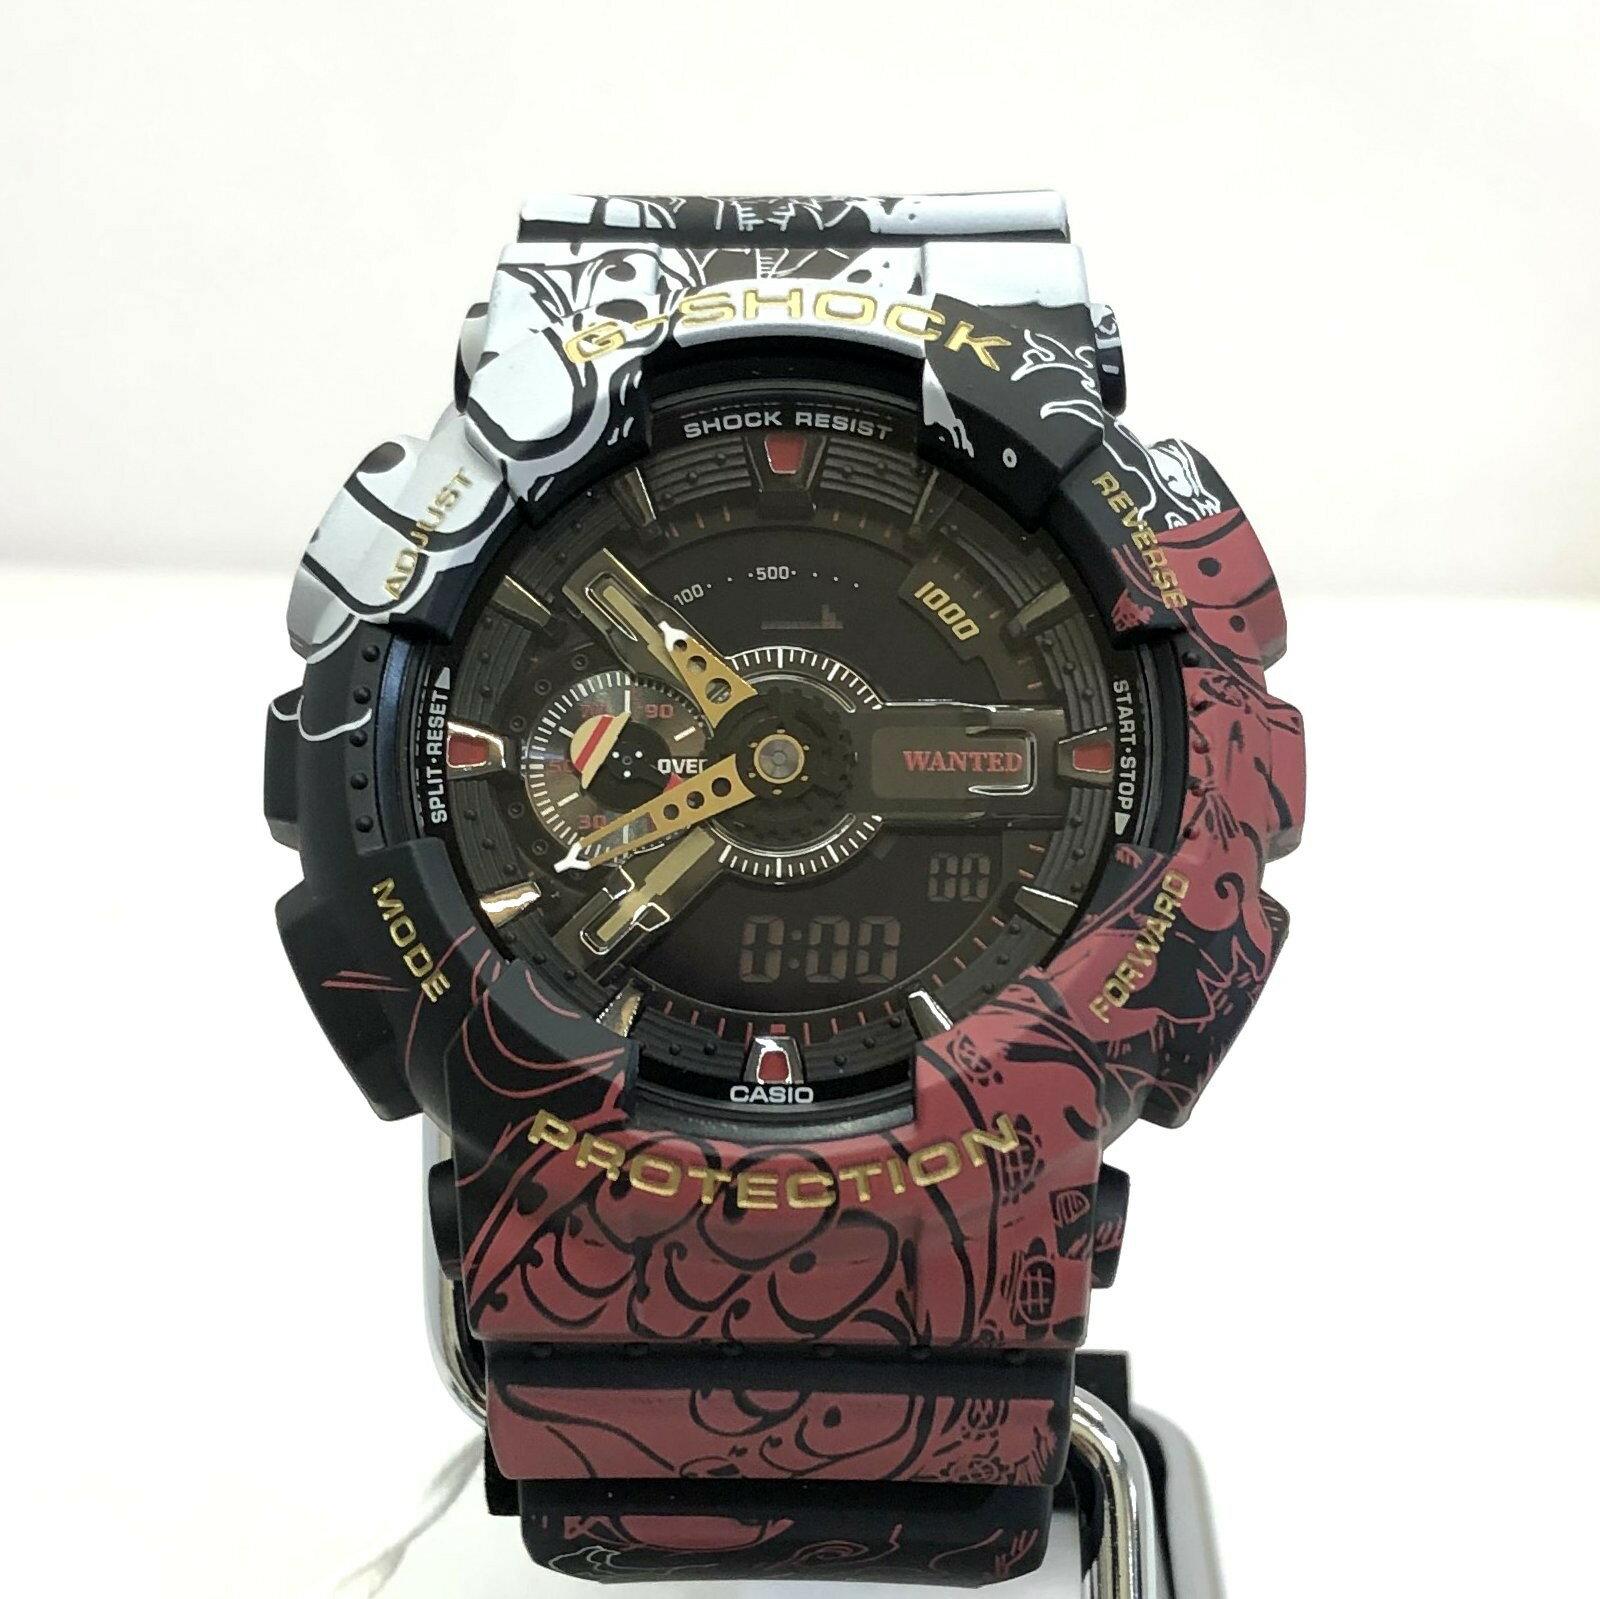 腕時計, メンズ腕時計 G-SHOCK CASIO GA-110JOP-1A4JR ONE-PIECE T ITZLIRWUNLGF RY5166